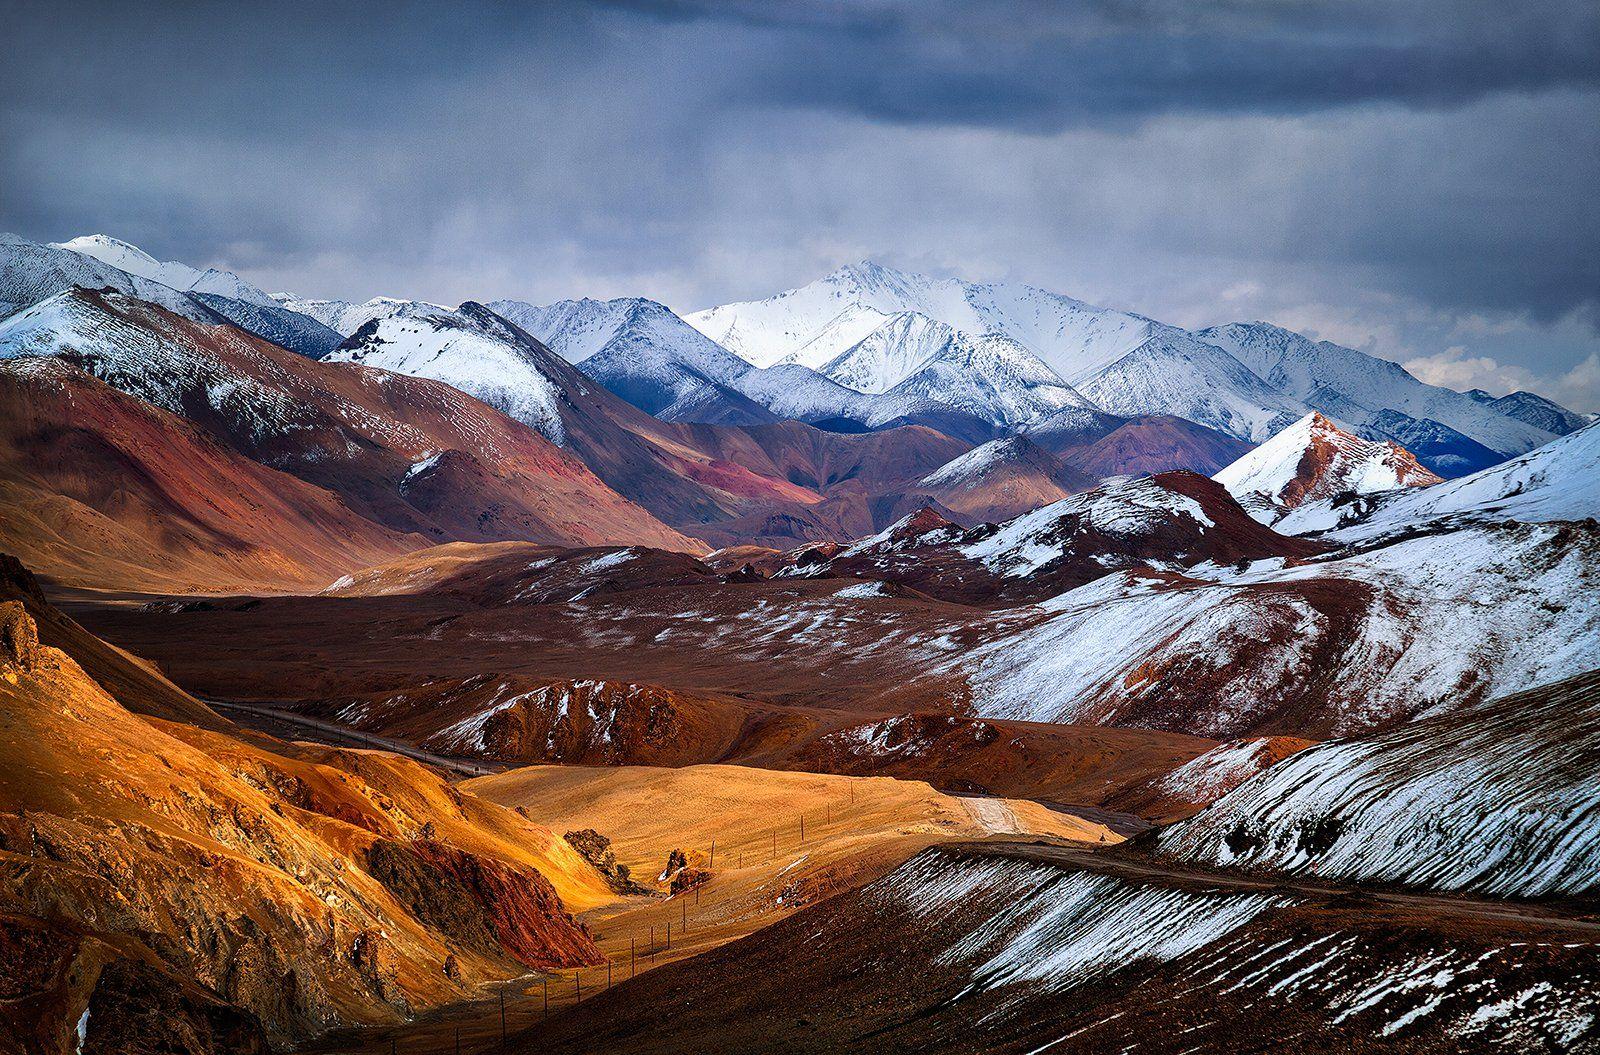 горы, памир, таджикистан, средняя азия, перевал, снег, Бирюков Юрий